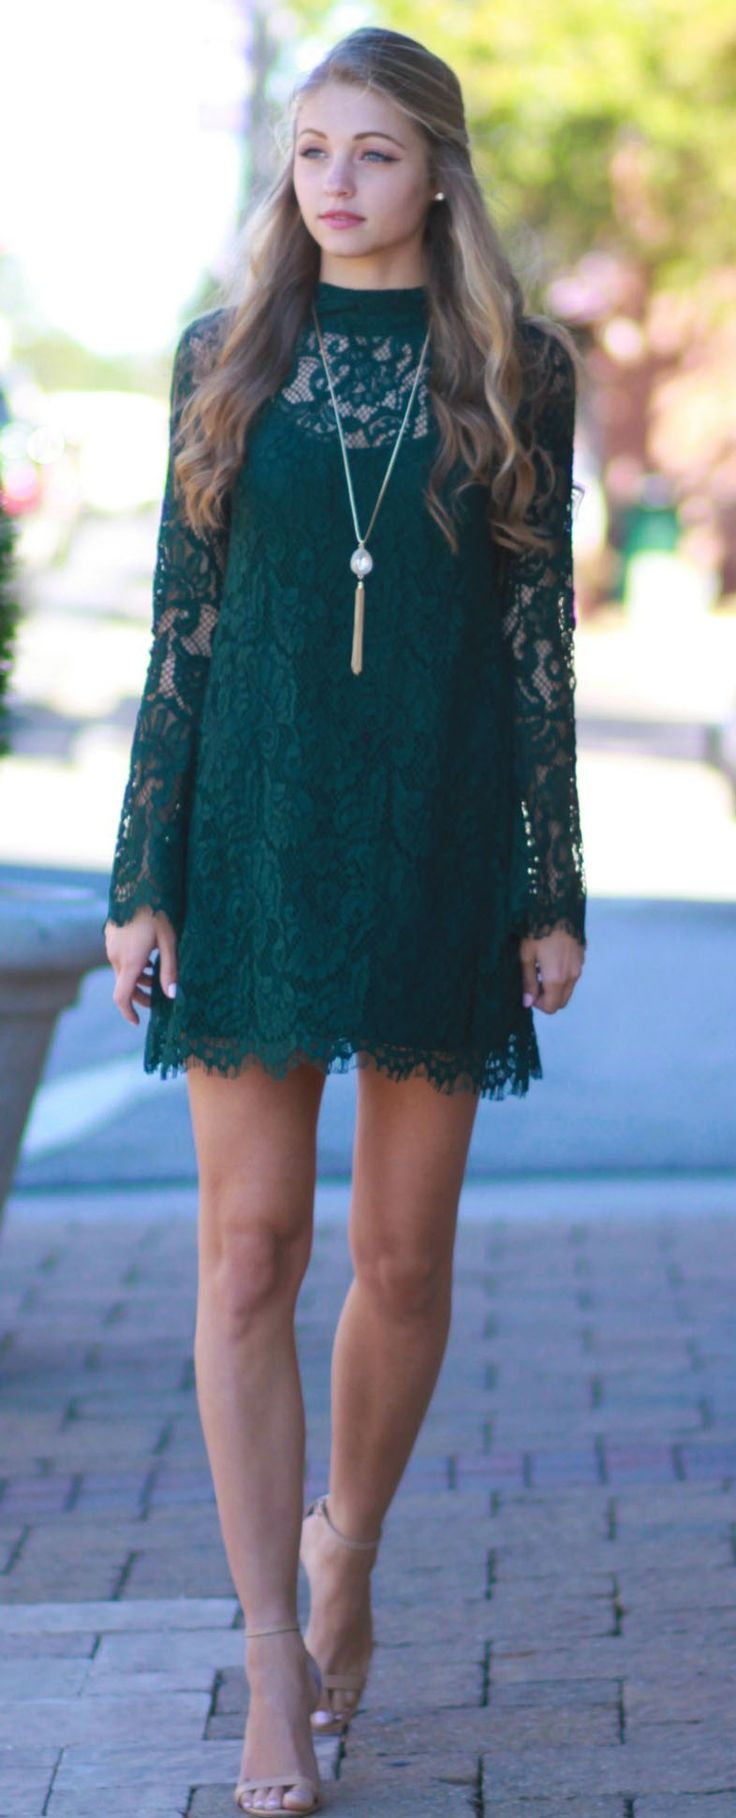 Best 20+ Semi formal dresses ideas on Pinterest